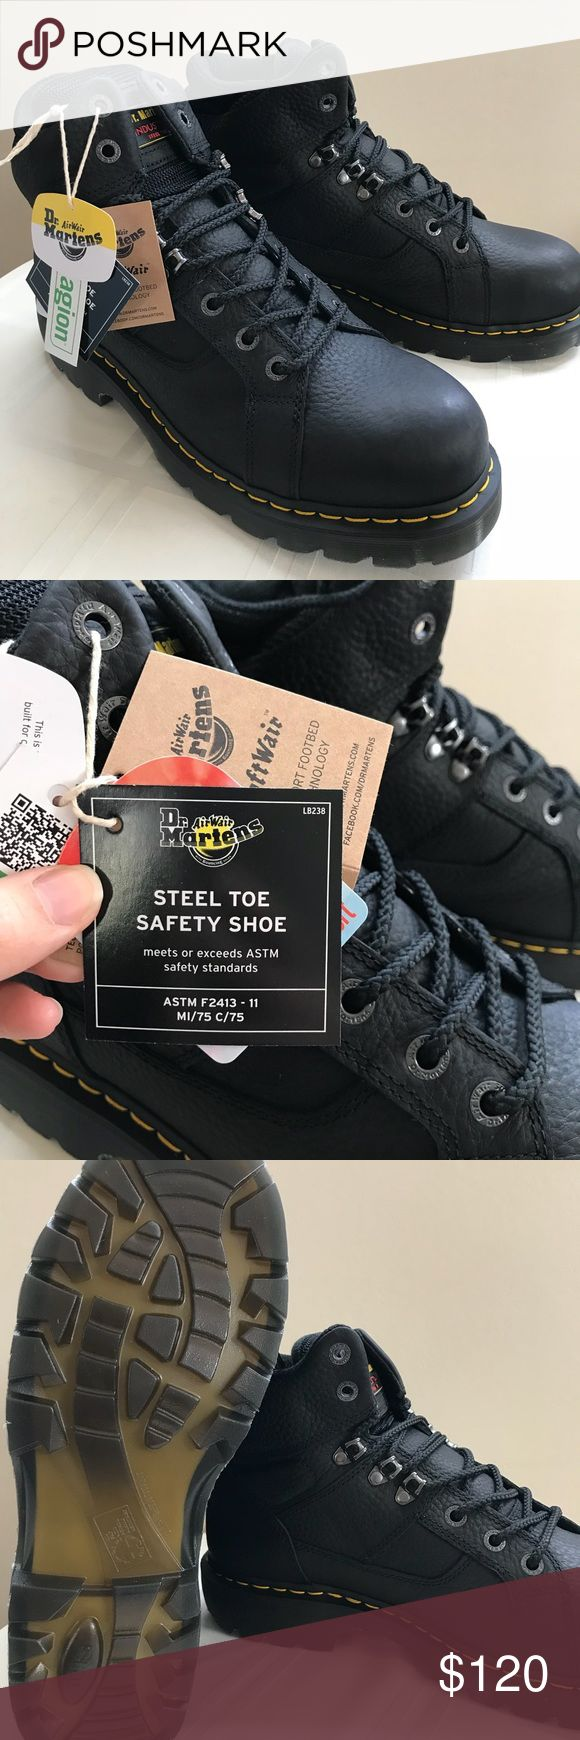 Black Steel Toe Boots Brand new, never worn size 14 Dr. Marten's Steel Toe Boots. Dr. Martens Shoes Boots